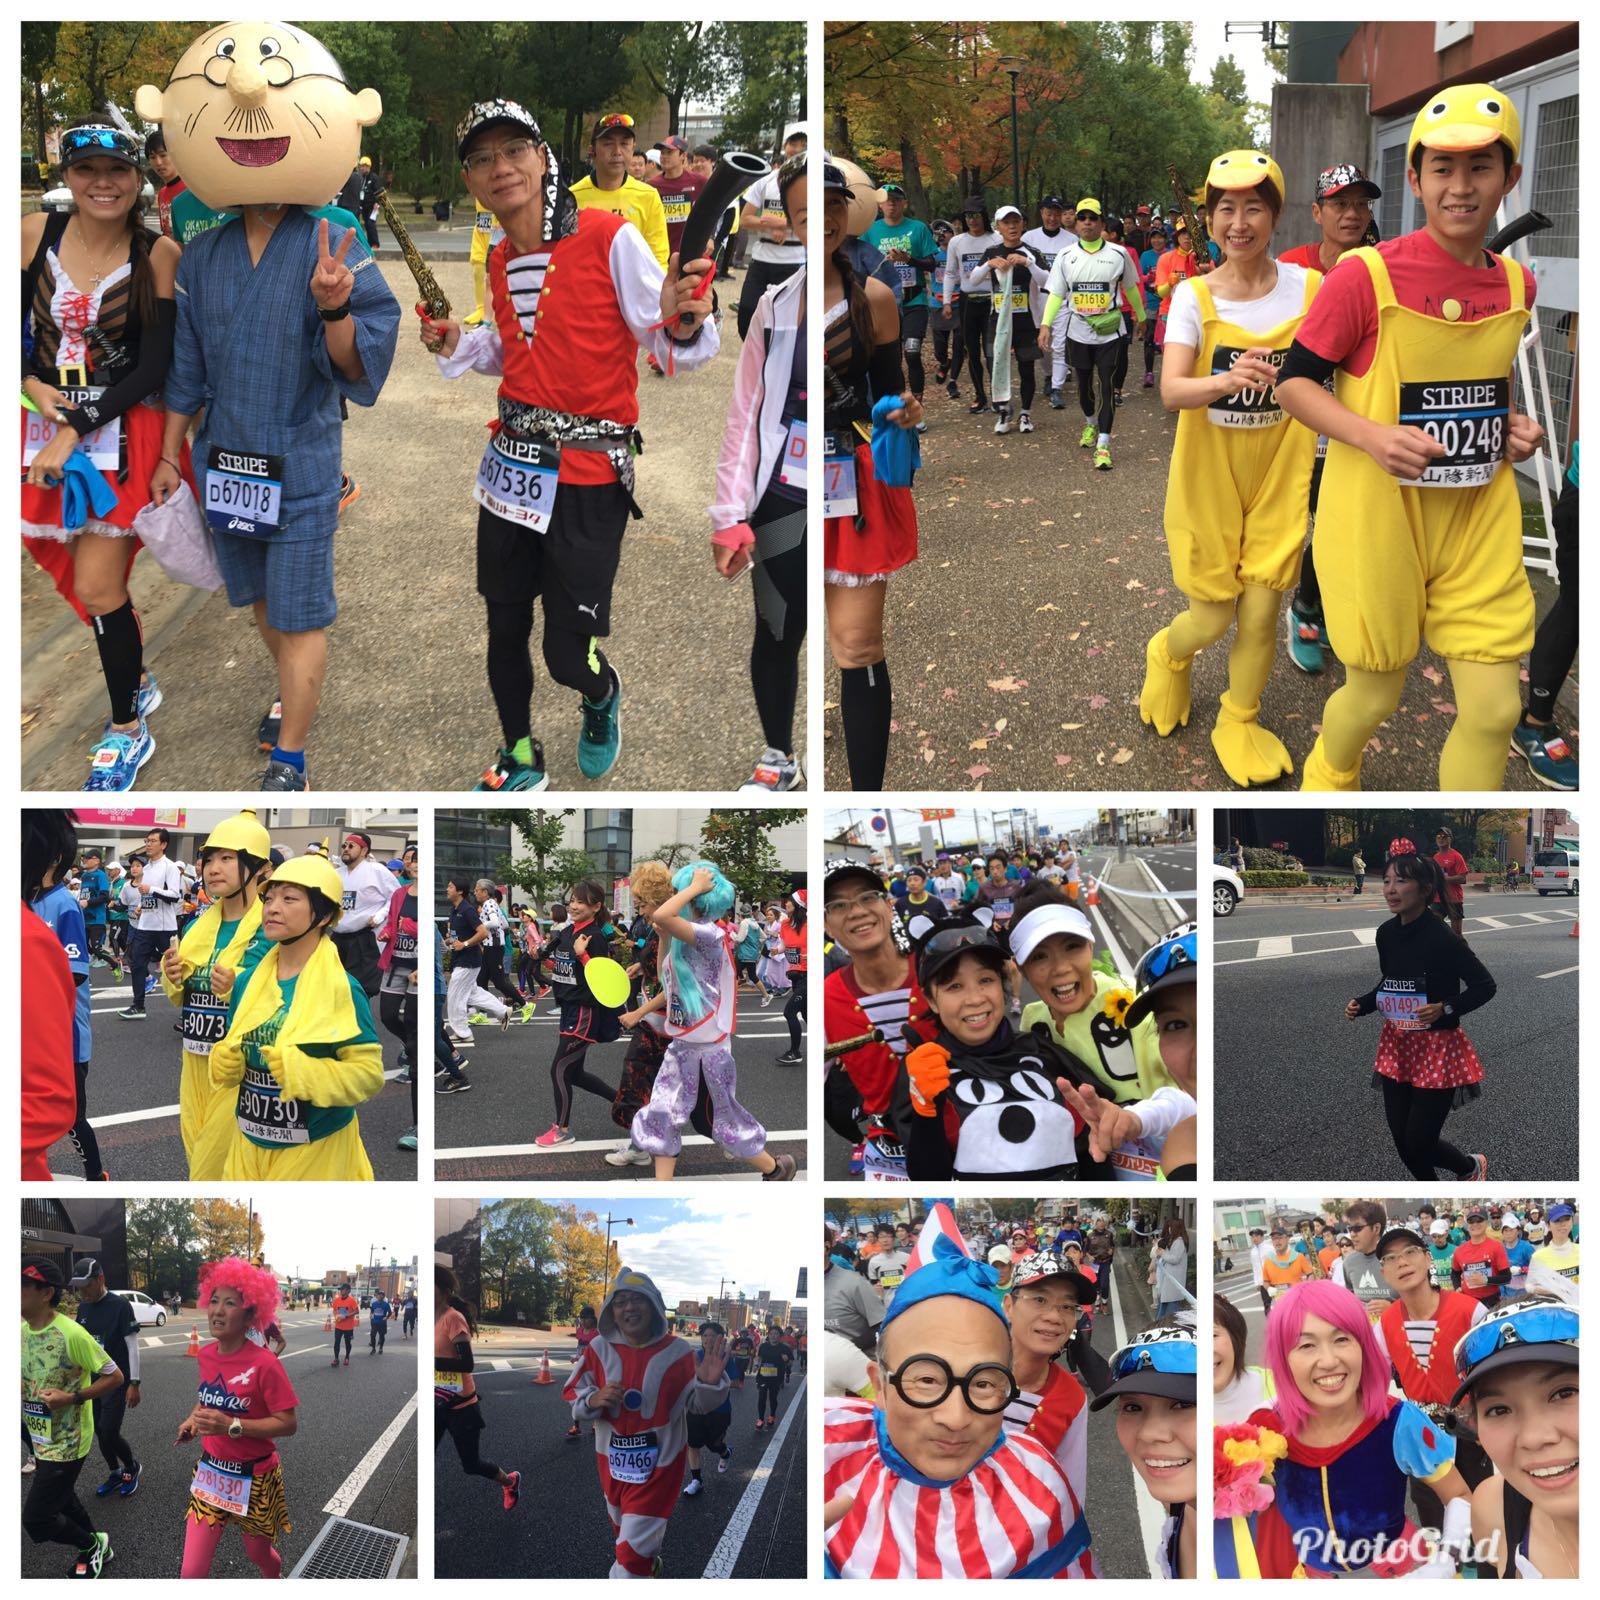 2017-11-16-PHOTO-00000695.jpg